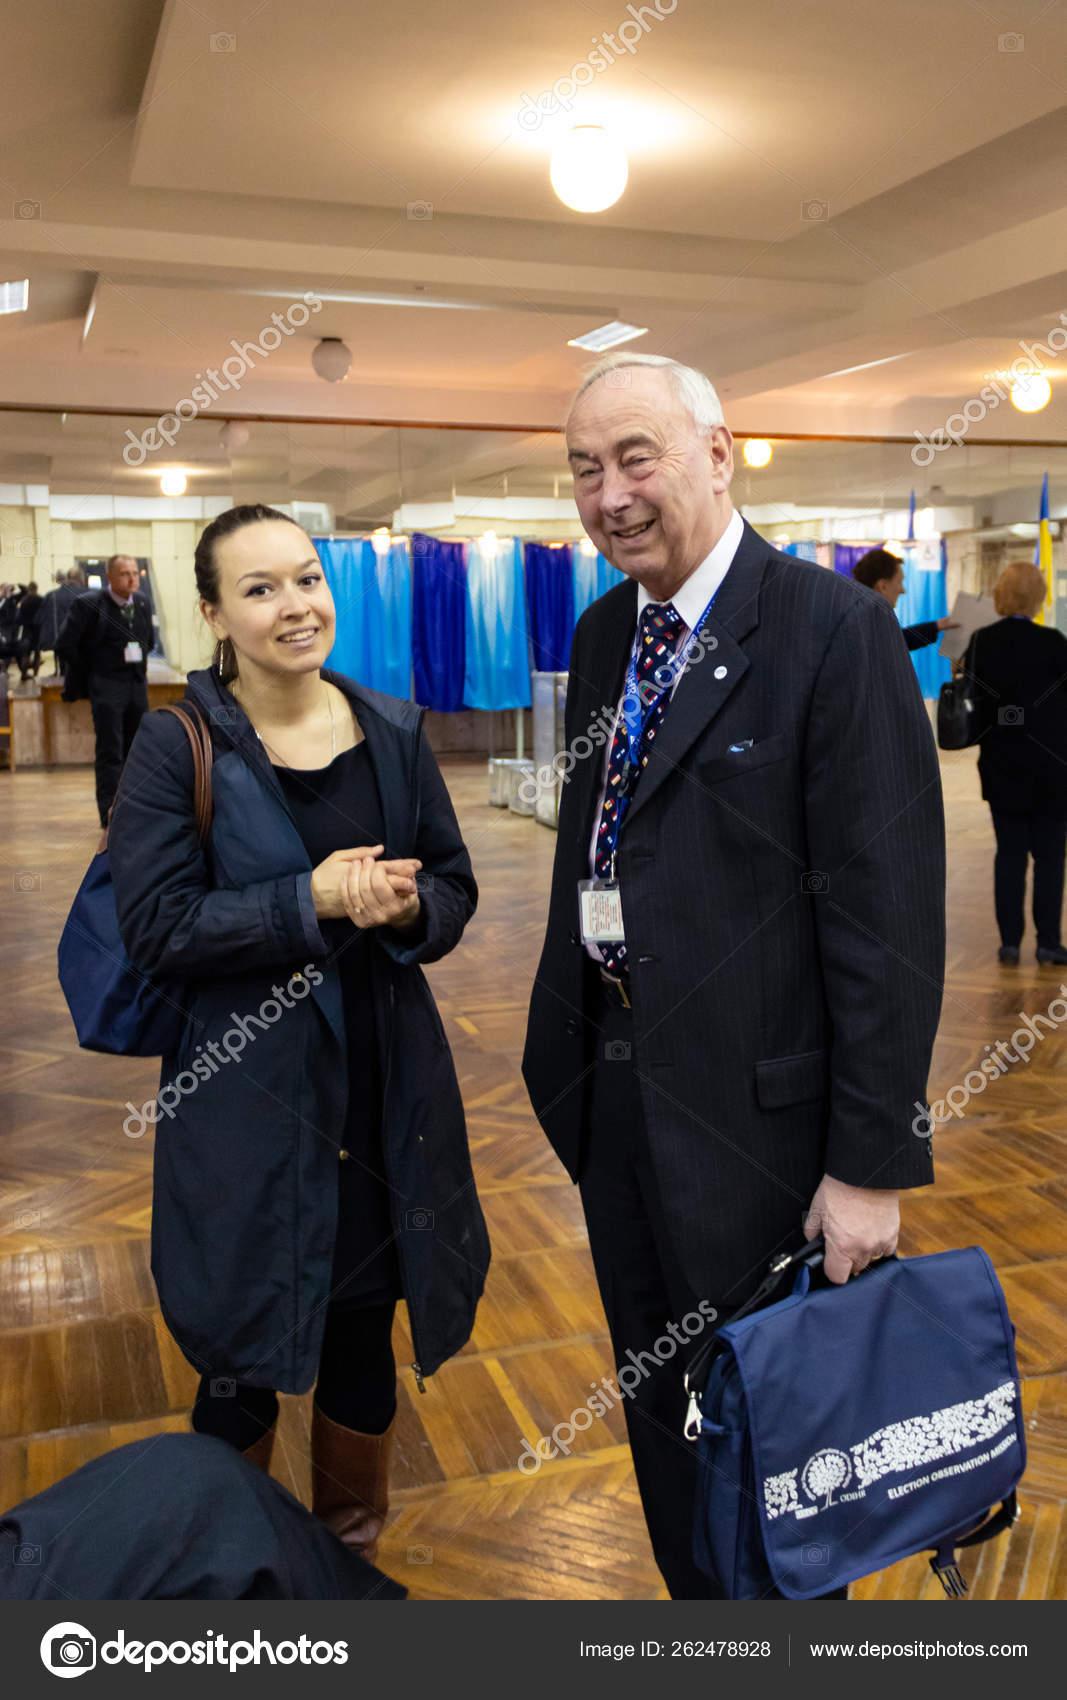 DNIPRO, UKRAINE - 2019 April, 21: Representatives of the OSCE and